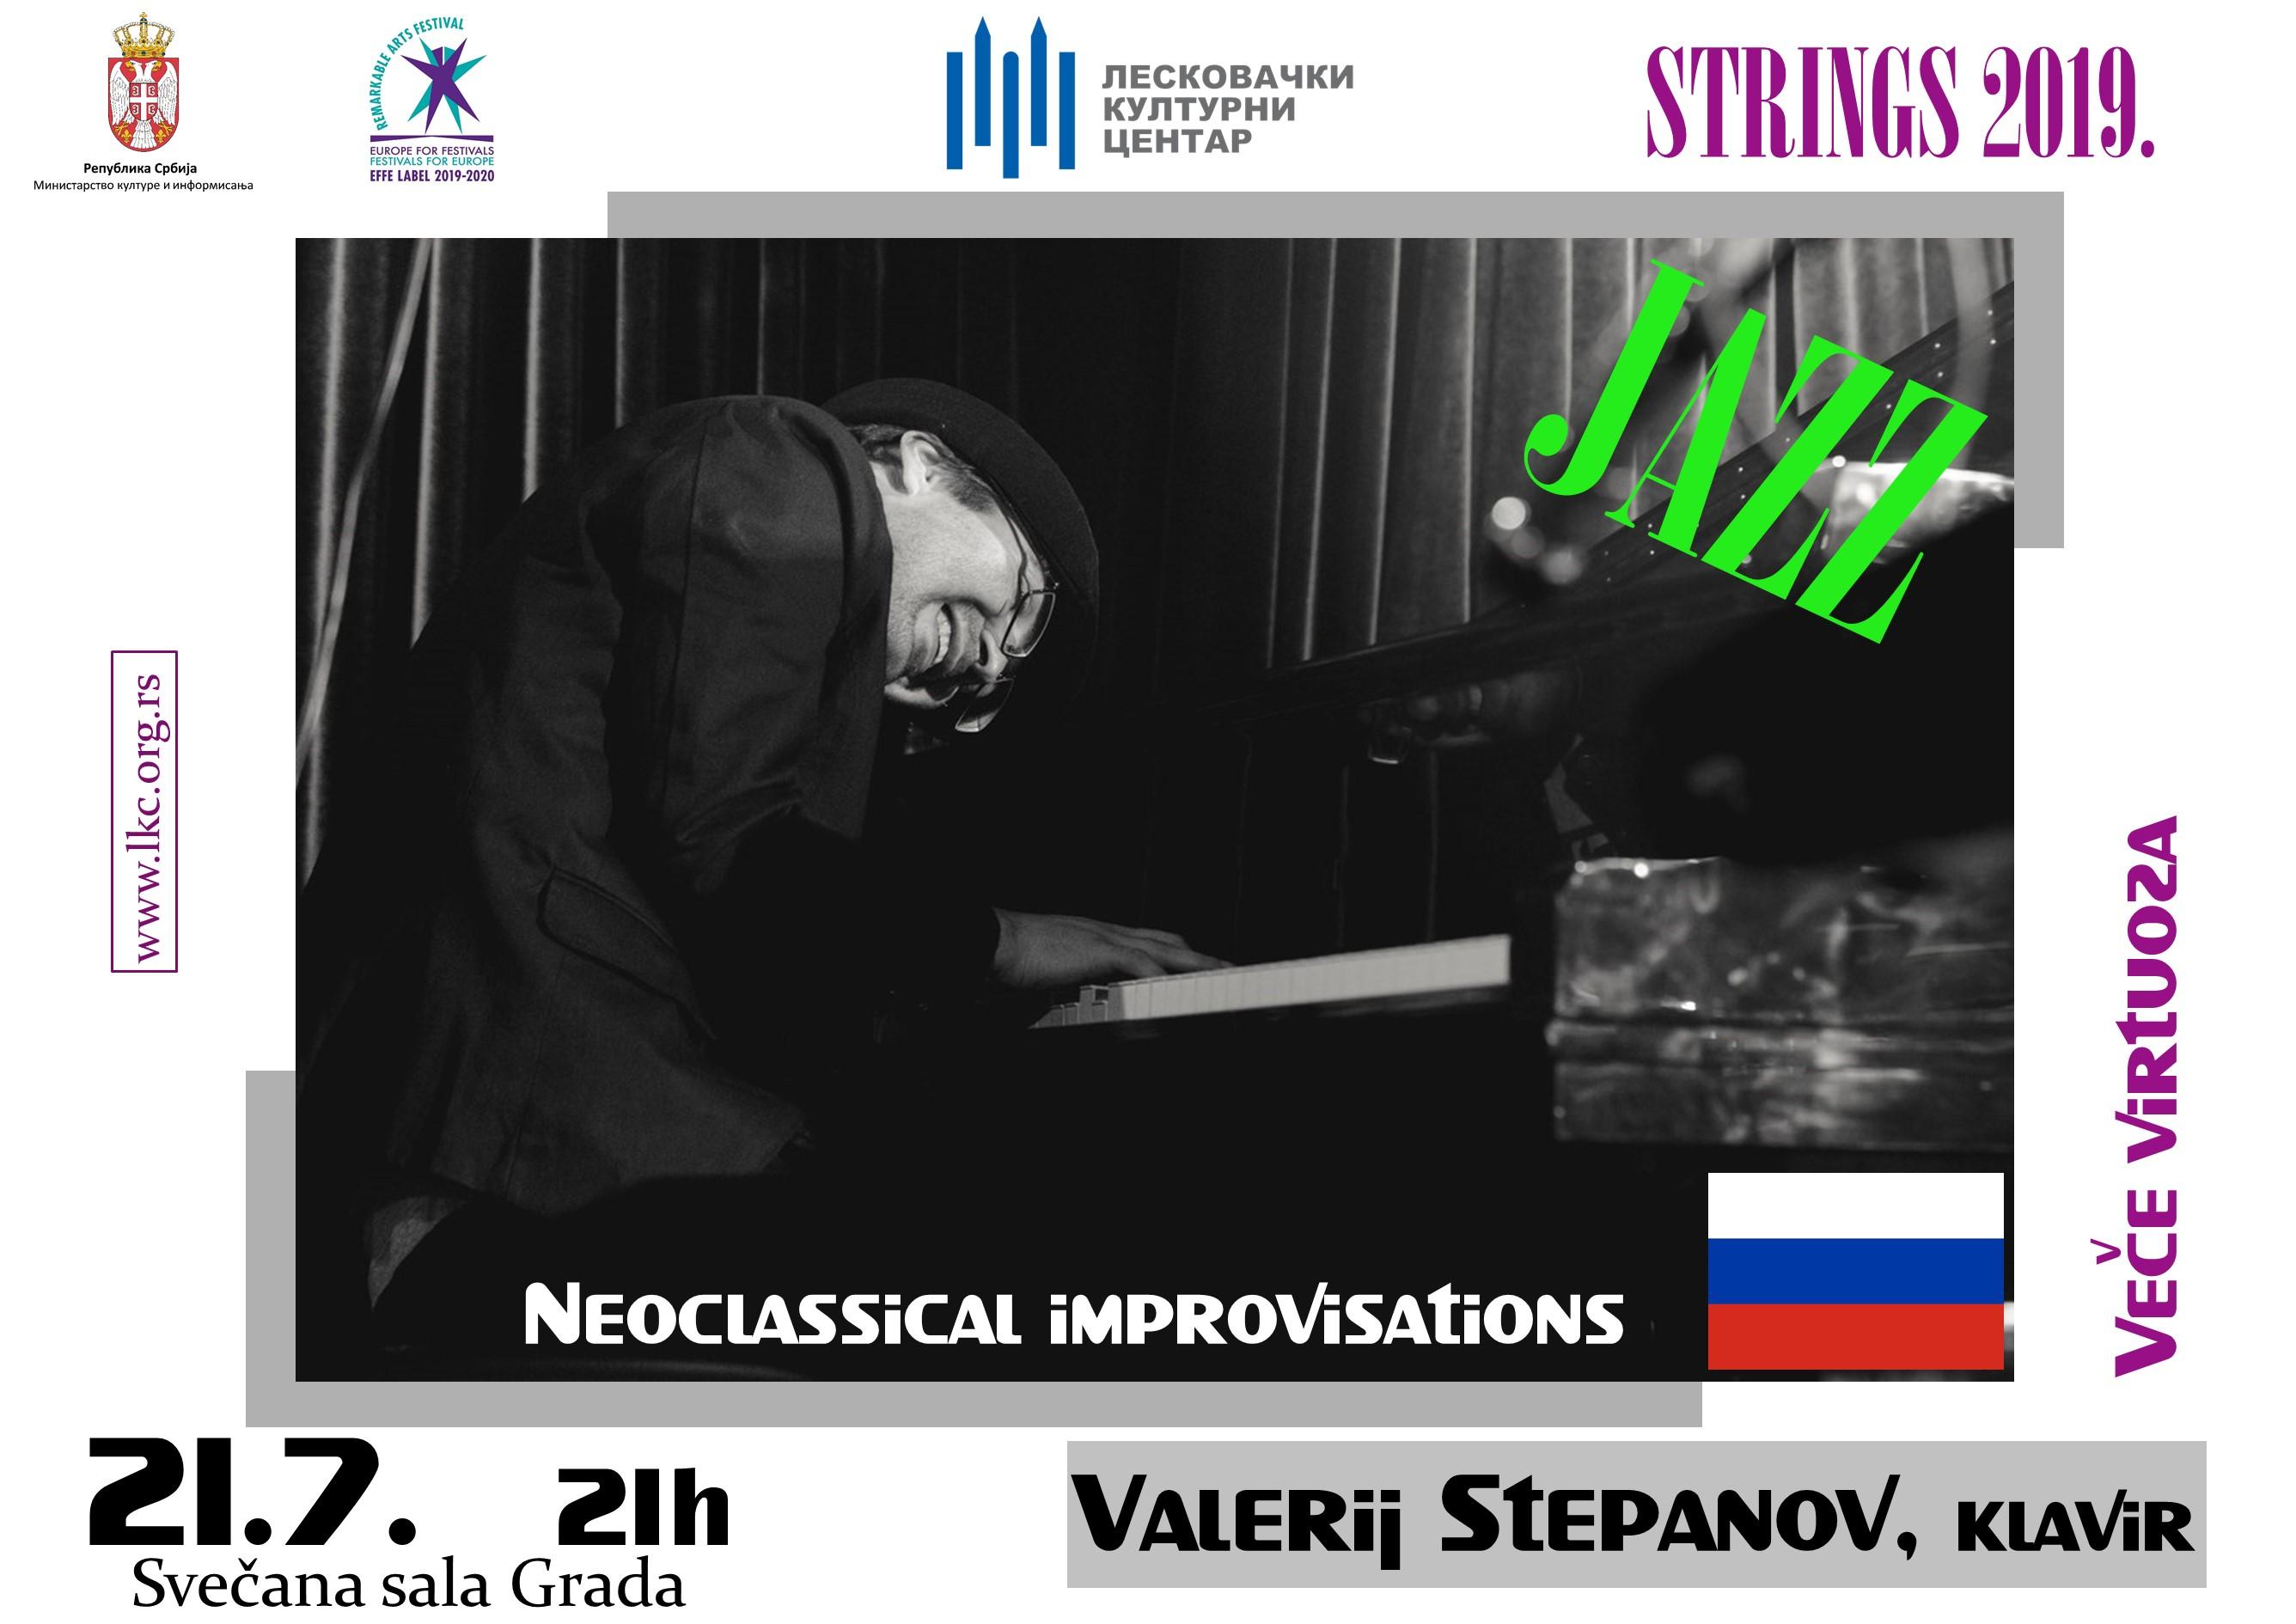 04. Valerij Stepanov, klavir B2 - ispravka